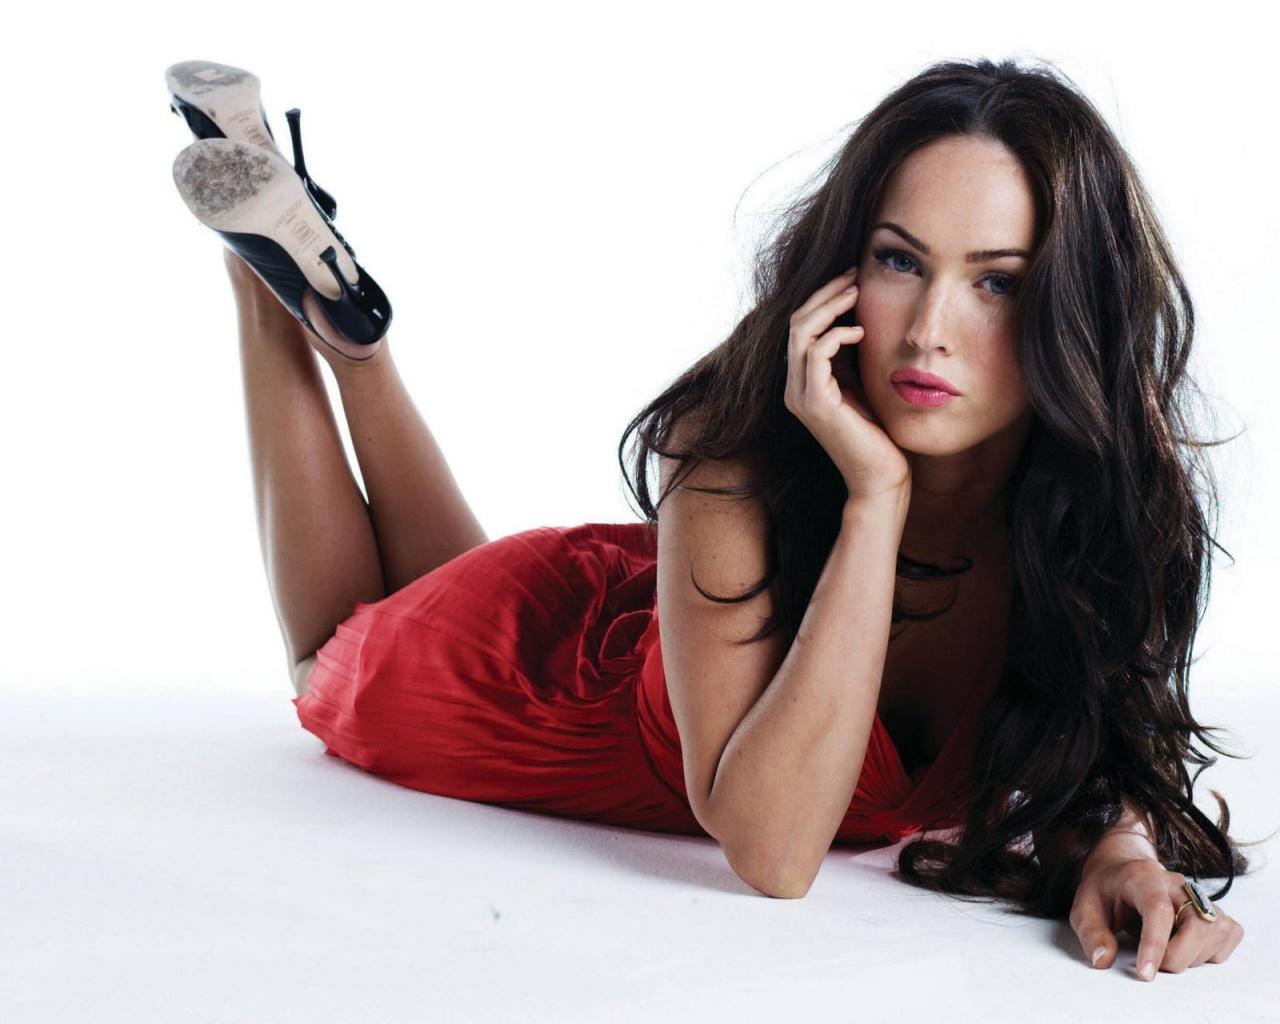 Megan Fox Desktop wallpapers 1280x1024 1280x1024